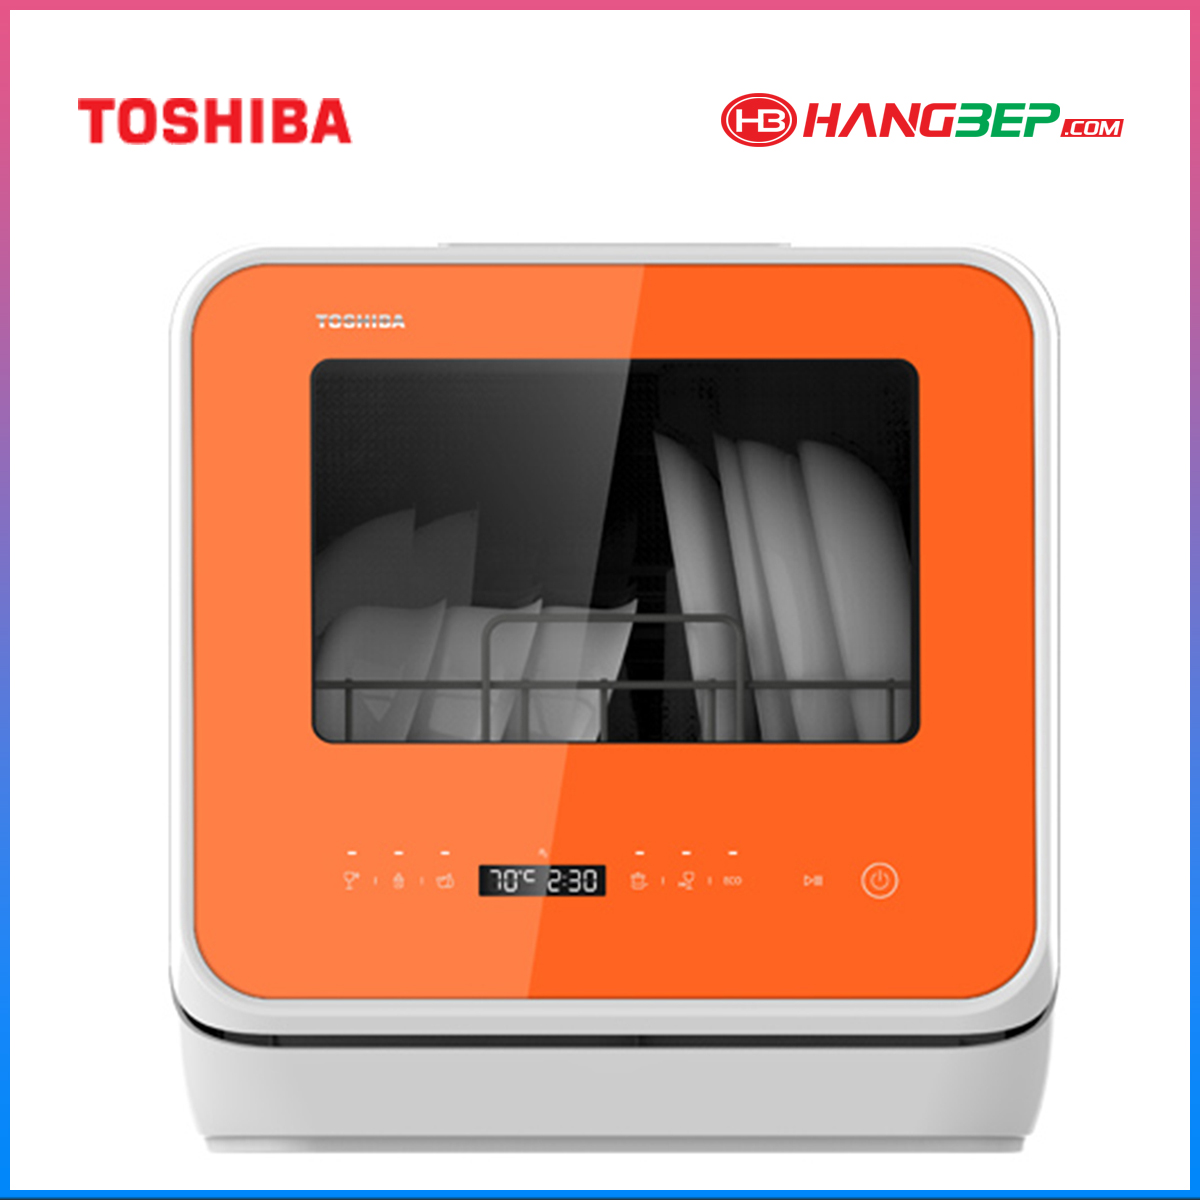 Máy rửa chén bát mini Toshiba DWS-22AVN - 3 bộ